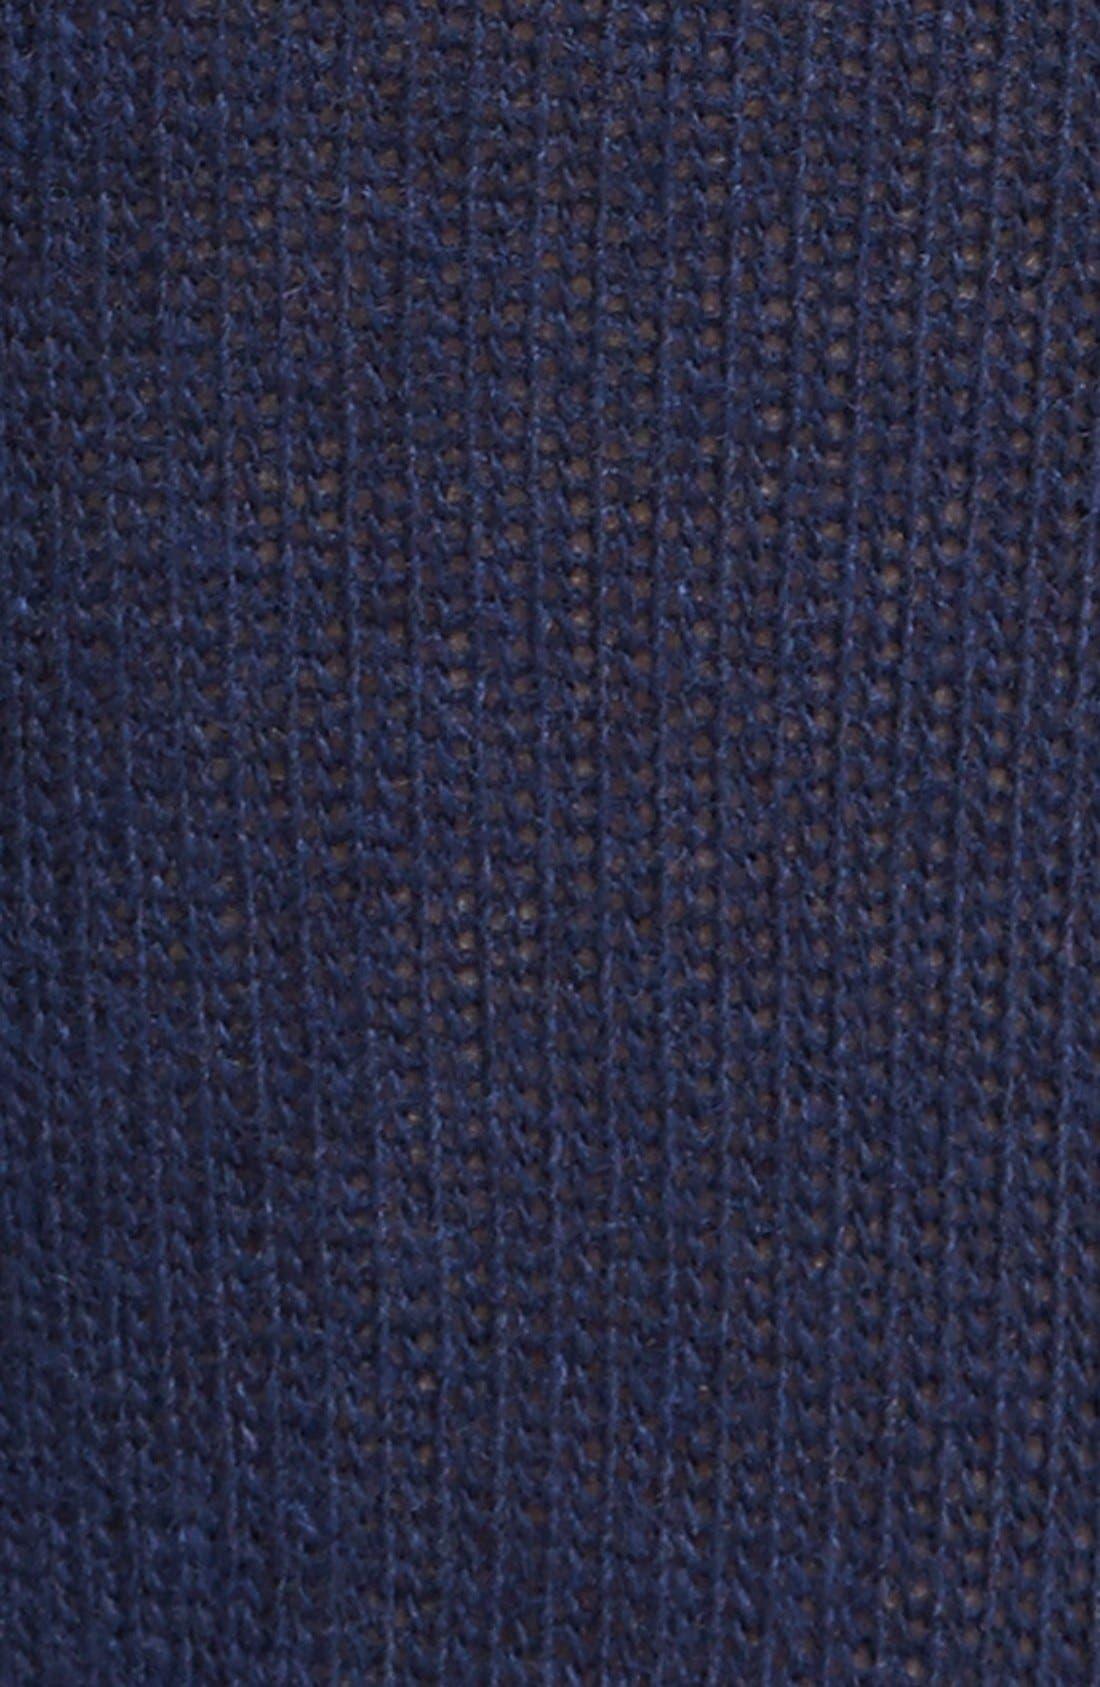 'Luxury' Crew Socks,                             Alternate thumbnail 9, color,